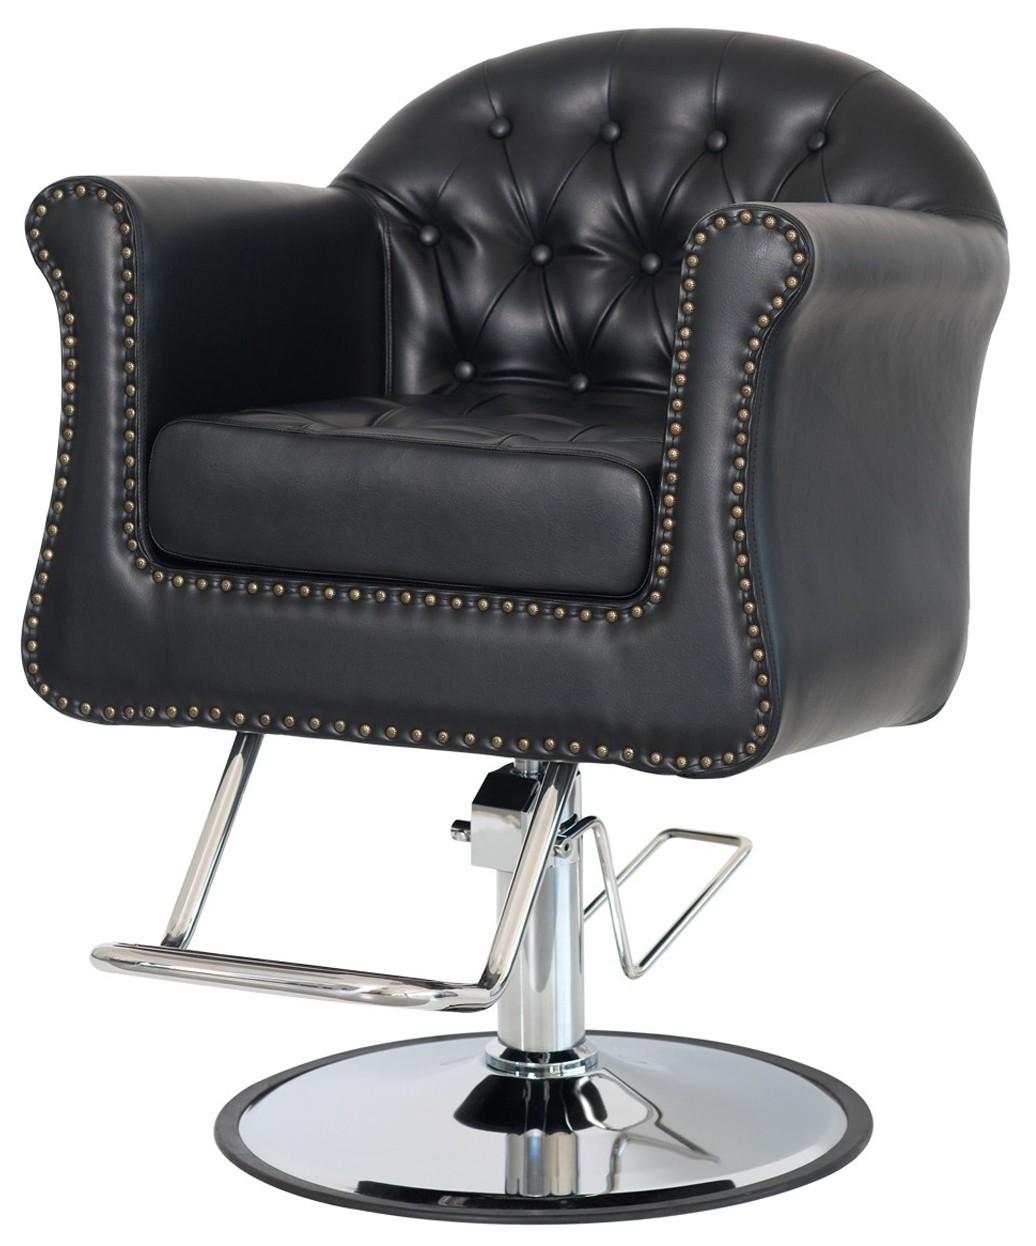 4 Operator Brooklyn & Miami Salon Package Brooklyn Styling Chair